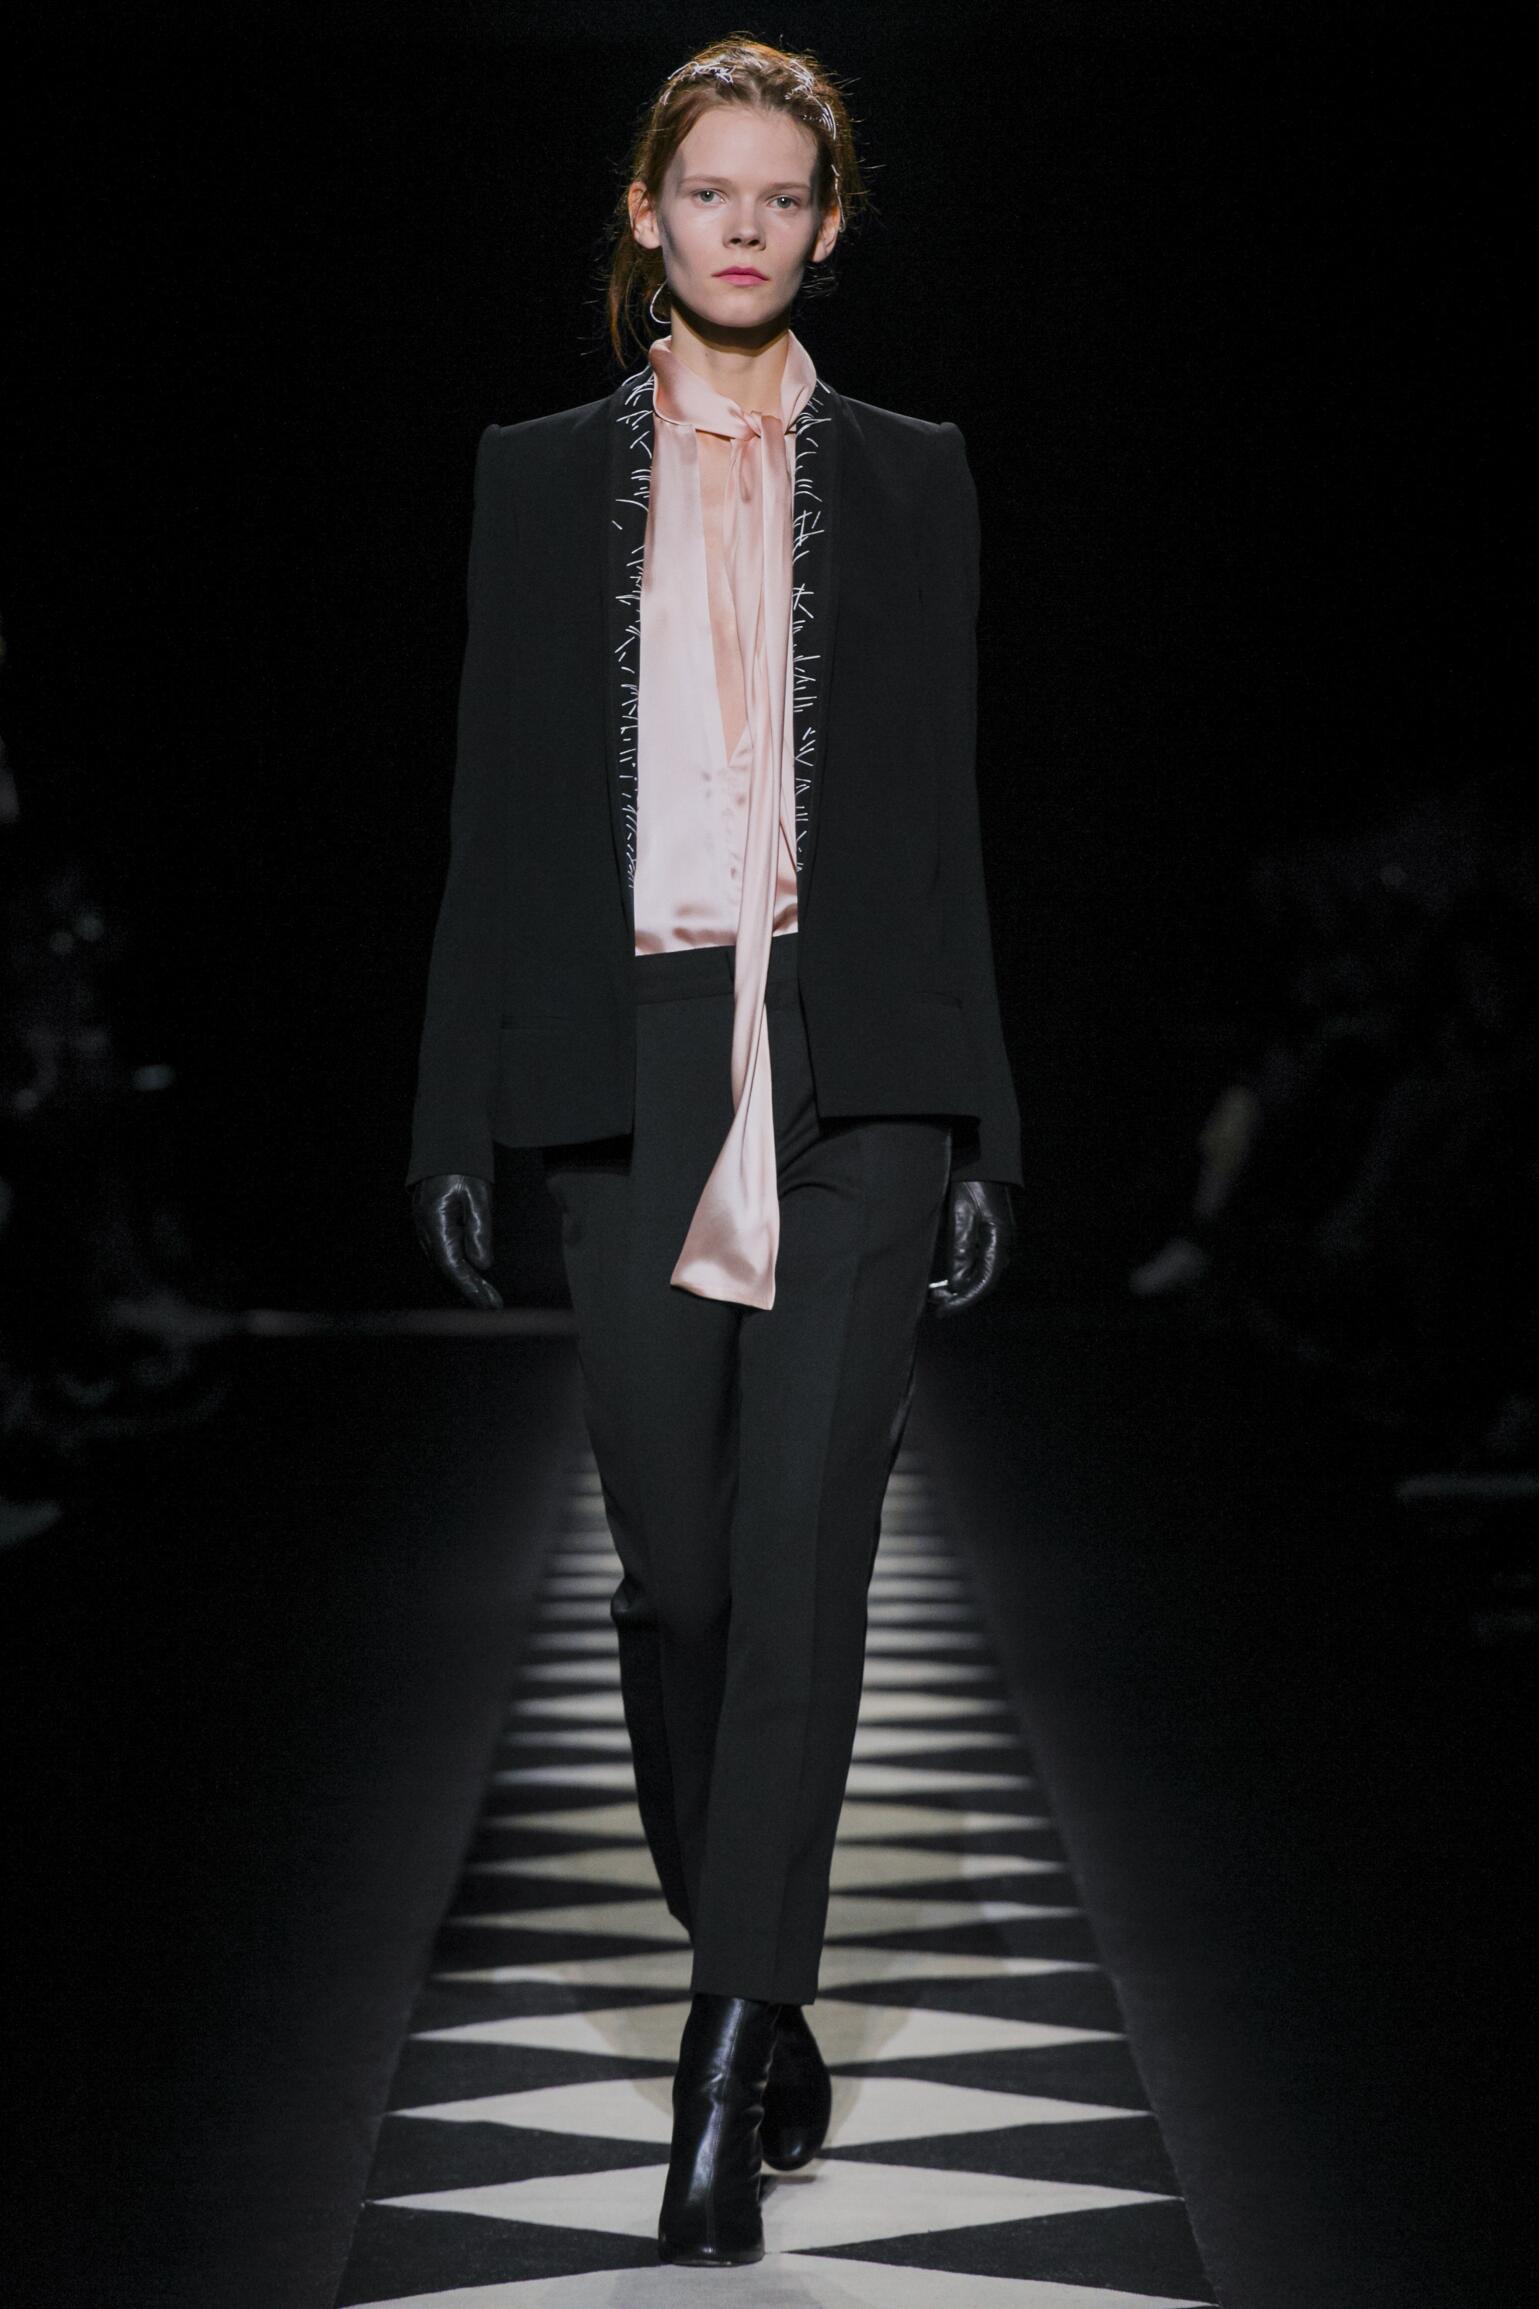 Runway Haider Ackermann Fall Winter 2015 16 Women's Collection Paris Fashion Week